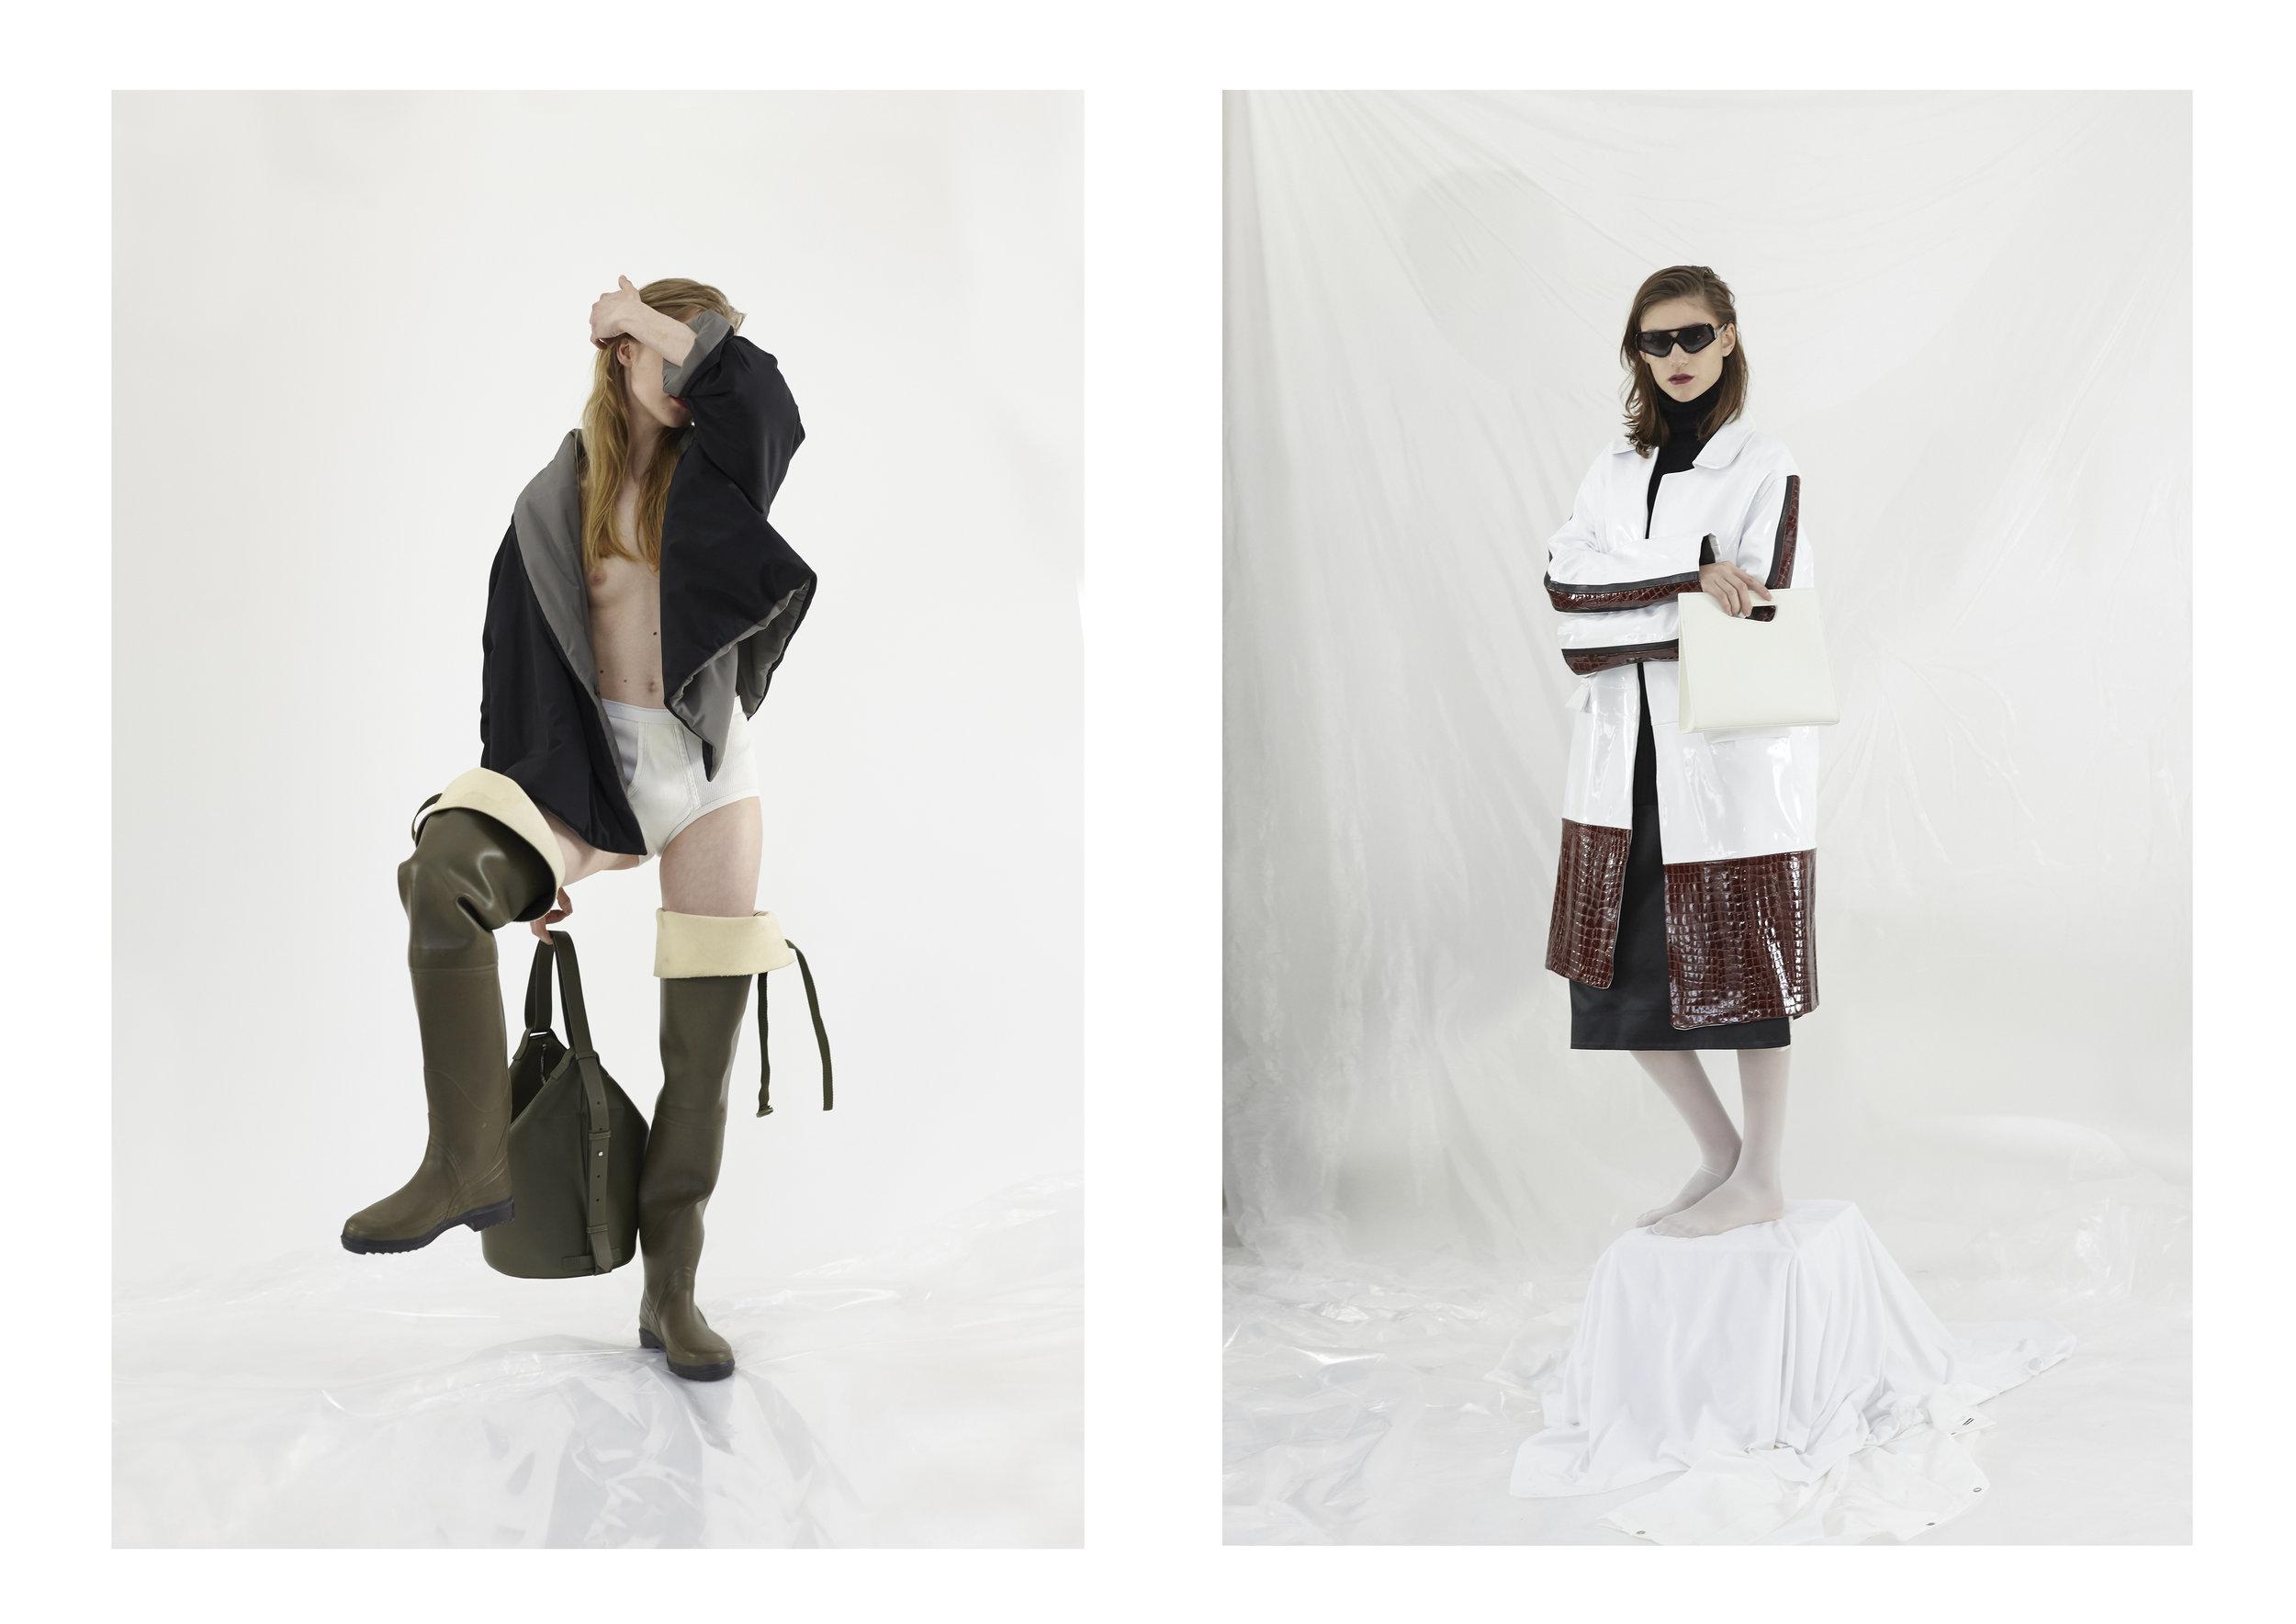 (left): Pierantonio Gasparri Coat, Lariulà Boots, Vintage Underwear, French Connection Bag 2nd (right): Federico Cina Coat, Spazio 76 per Northen Lights Sunglasses, Kitayama Studio Bag, Stylist's own skirt, Calzedonia Tights